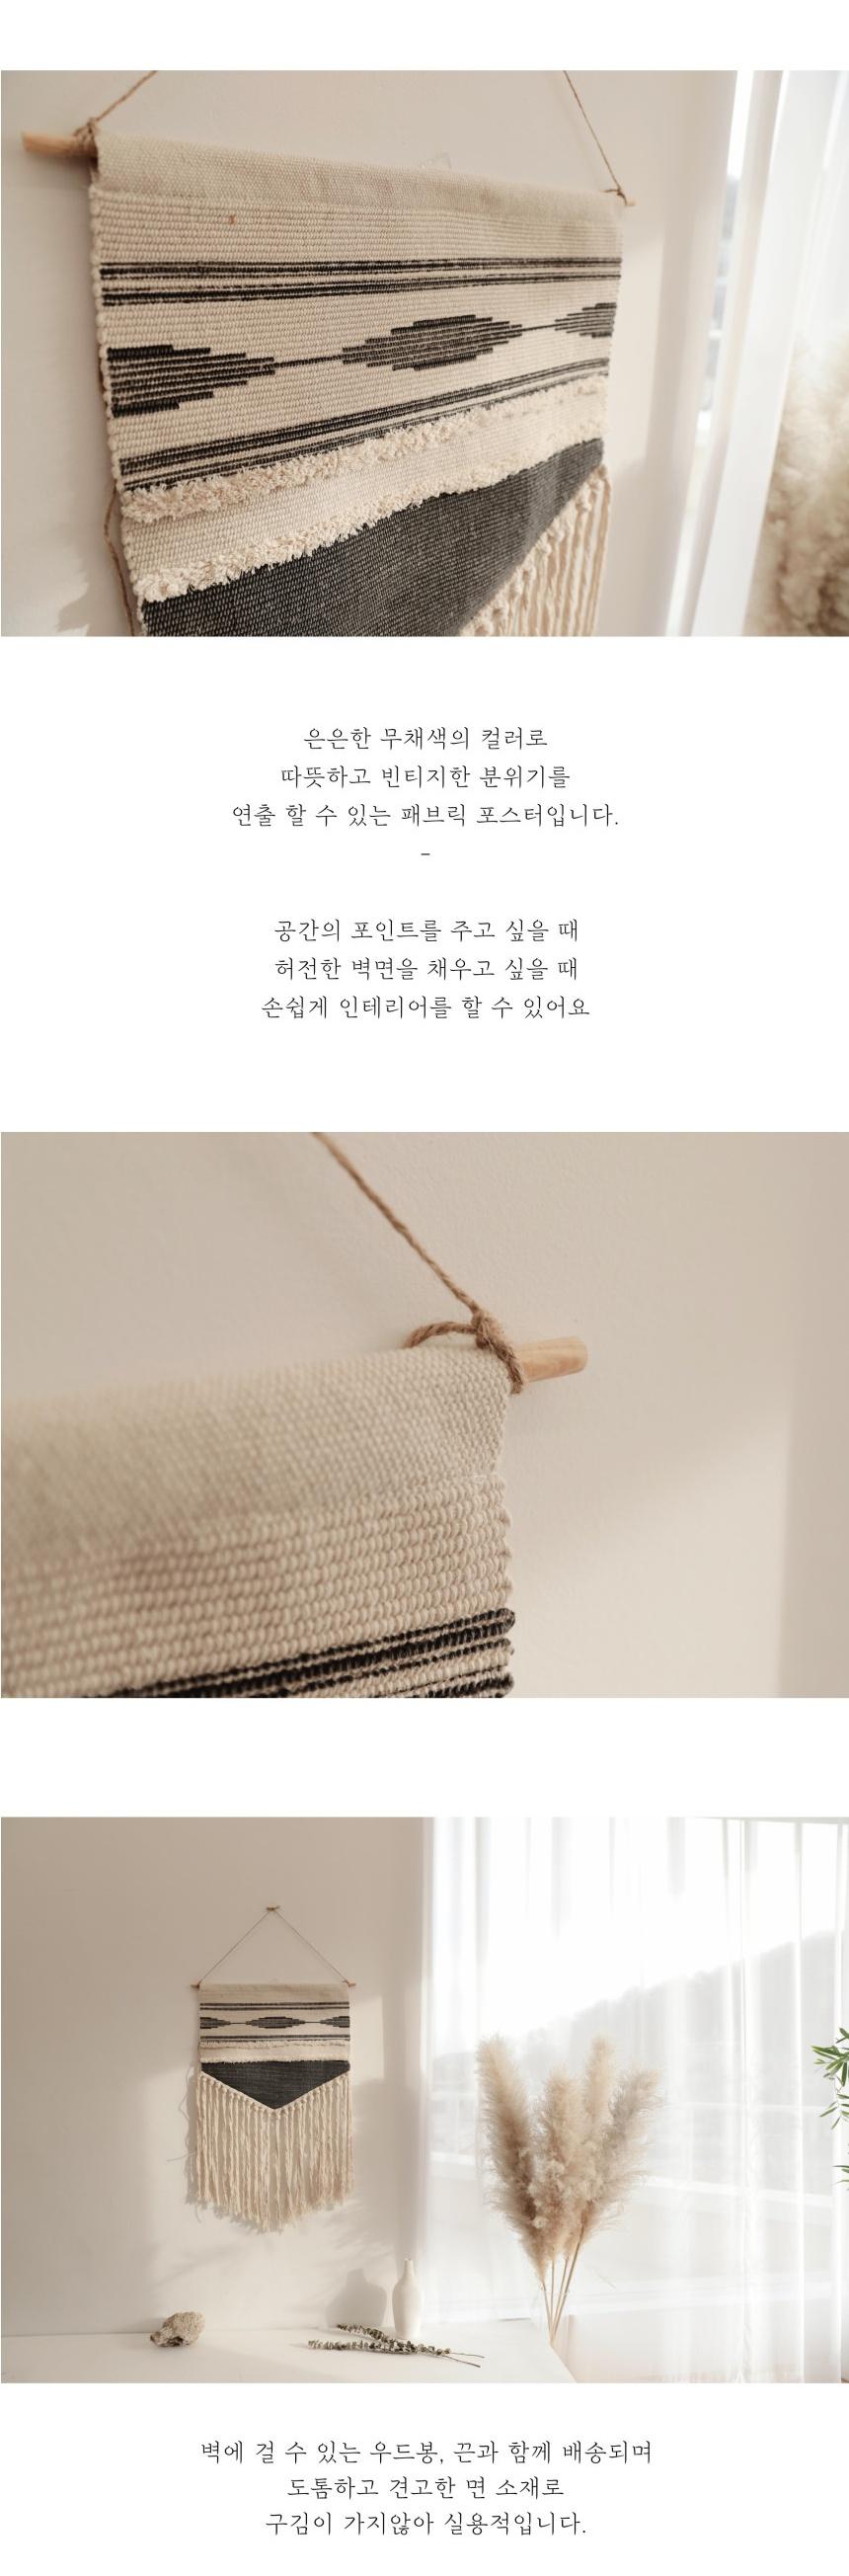 bohemian_cotton_fabricposter_02.jpg